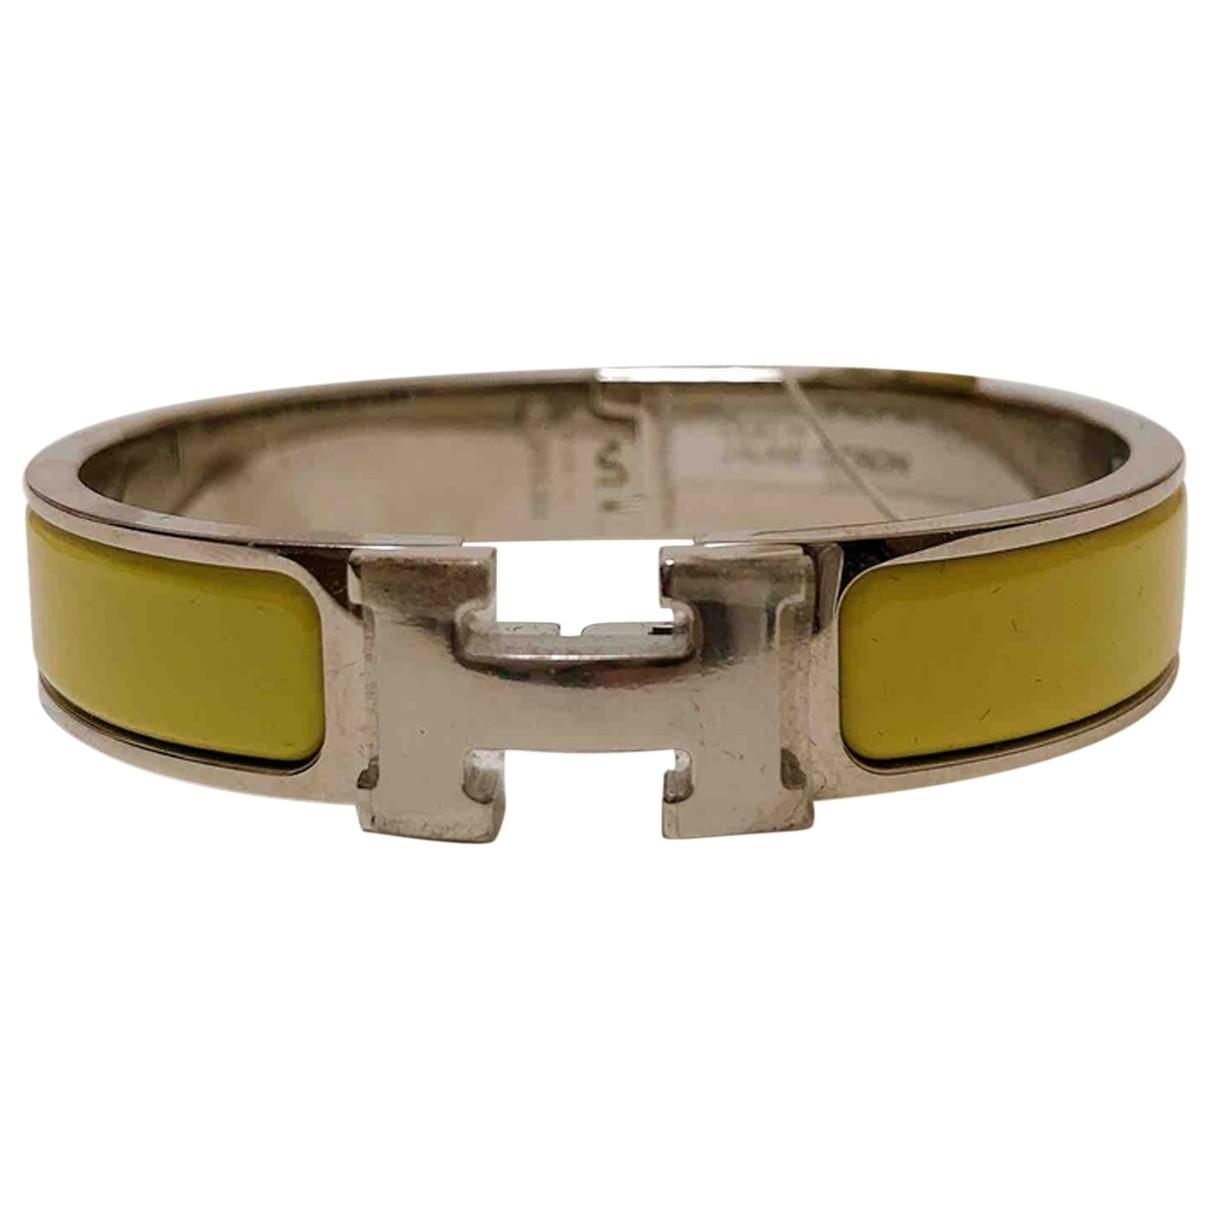 10 acero inoxidable remates Ø 4 mm fabrican pulsera joyas extremo id4